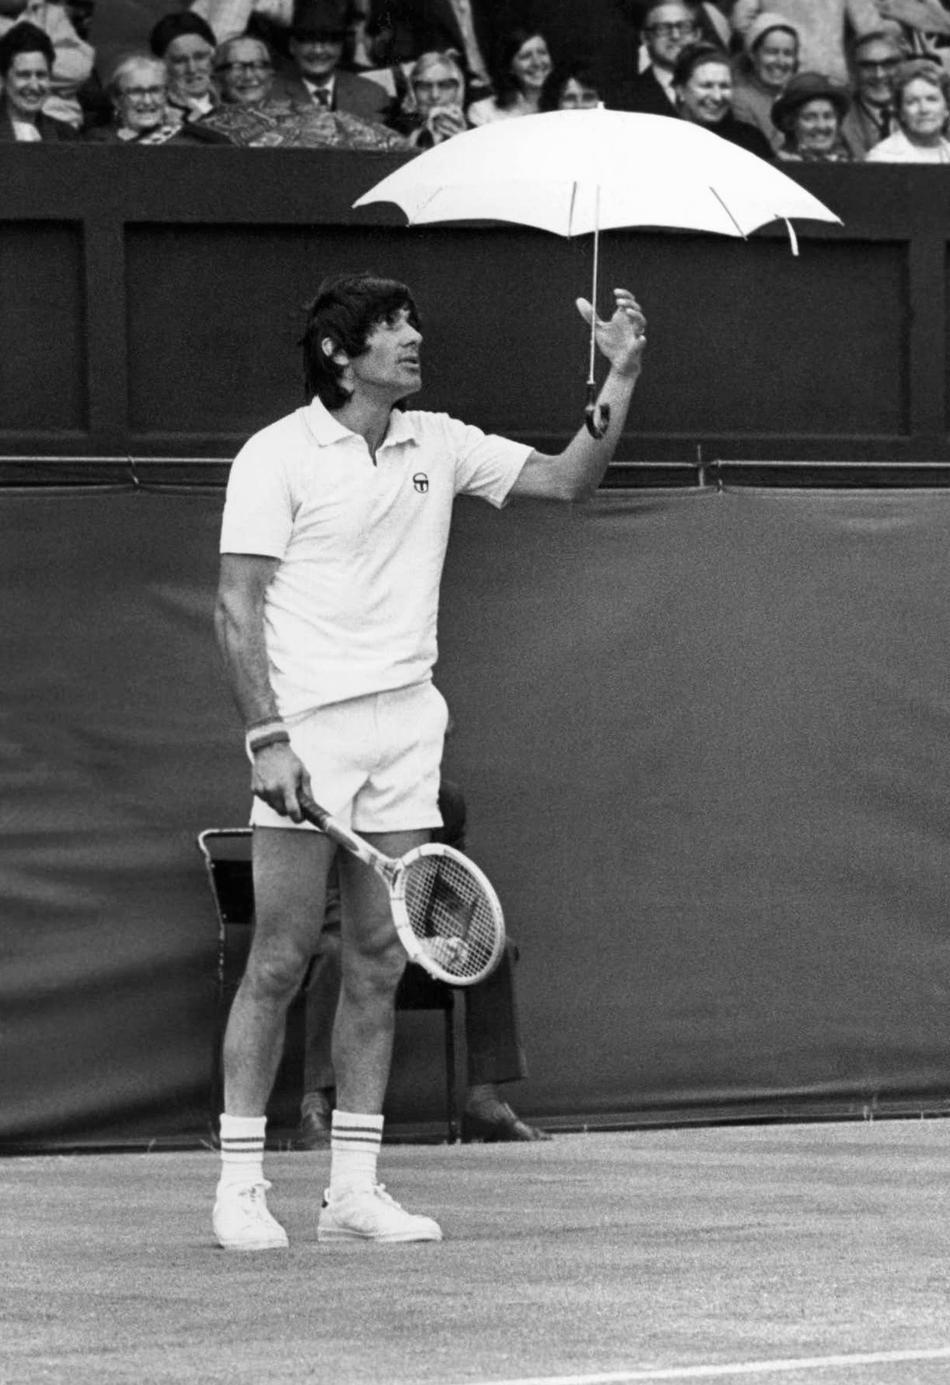 Una mirada atrás en Wimbledon IV